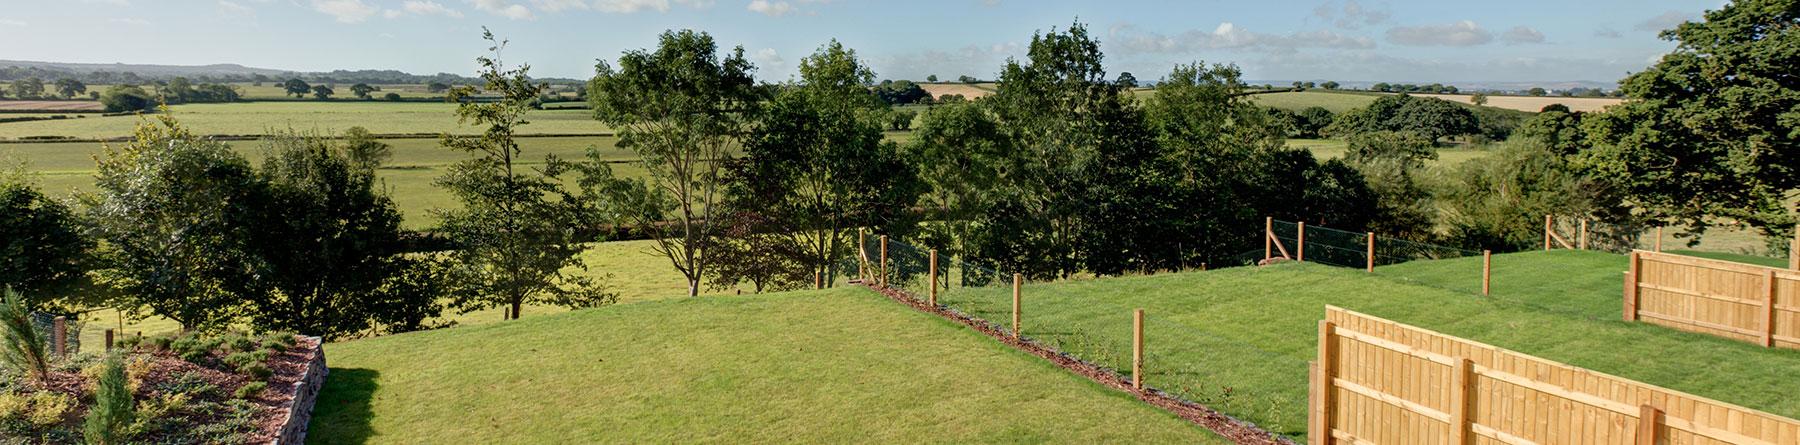 home-cedar-balcony-view-1